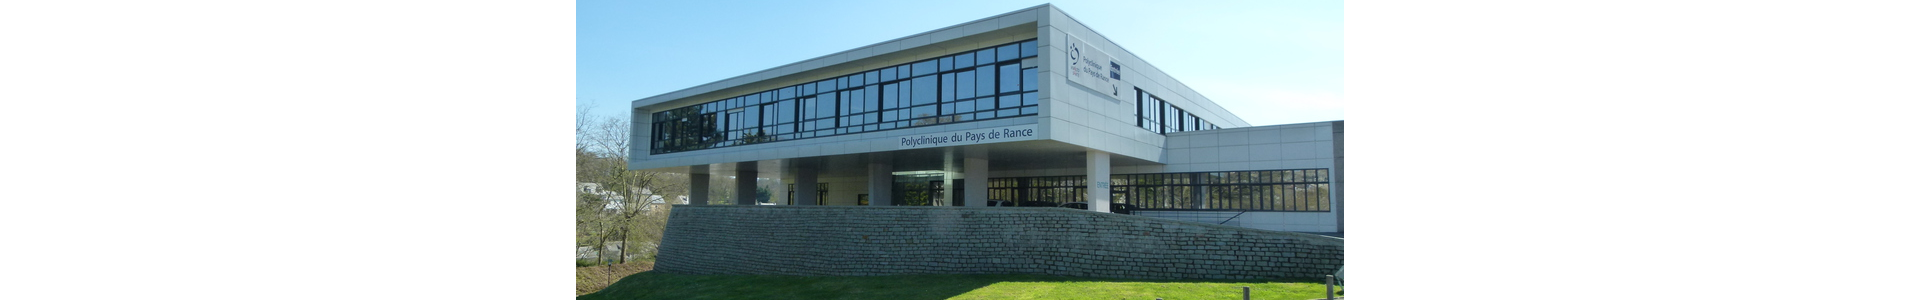 Façade Polyclinique du Pays de Rance - Dinan